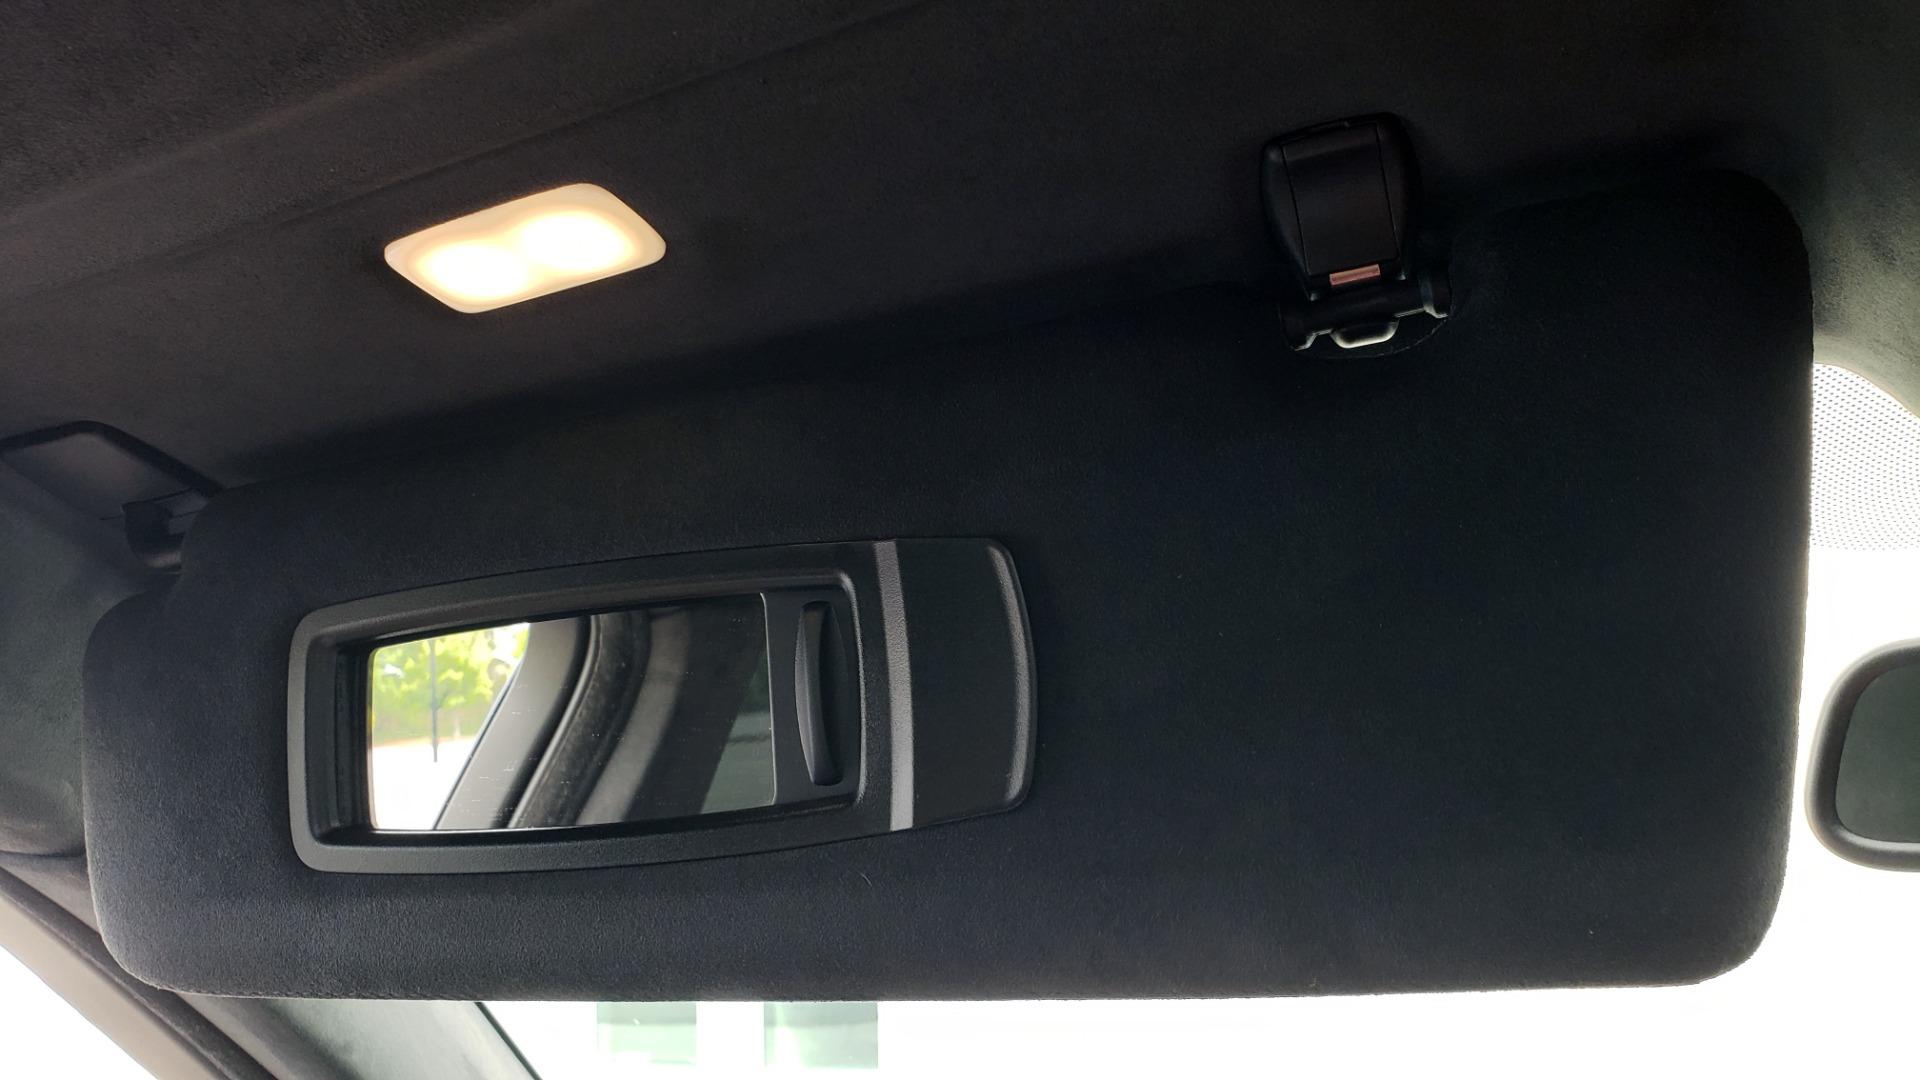 Used 2017 BMW X5 M EXECUTIVE PKG / NAV / DRVR ASST / BSM / HUD / HTD STS / WIFI for sale Sold at Formula Imports in Charlotte NC 28227 56